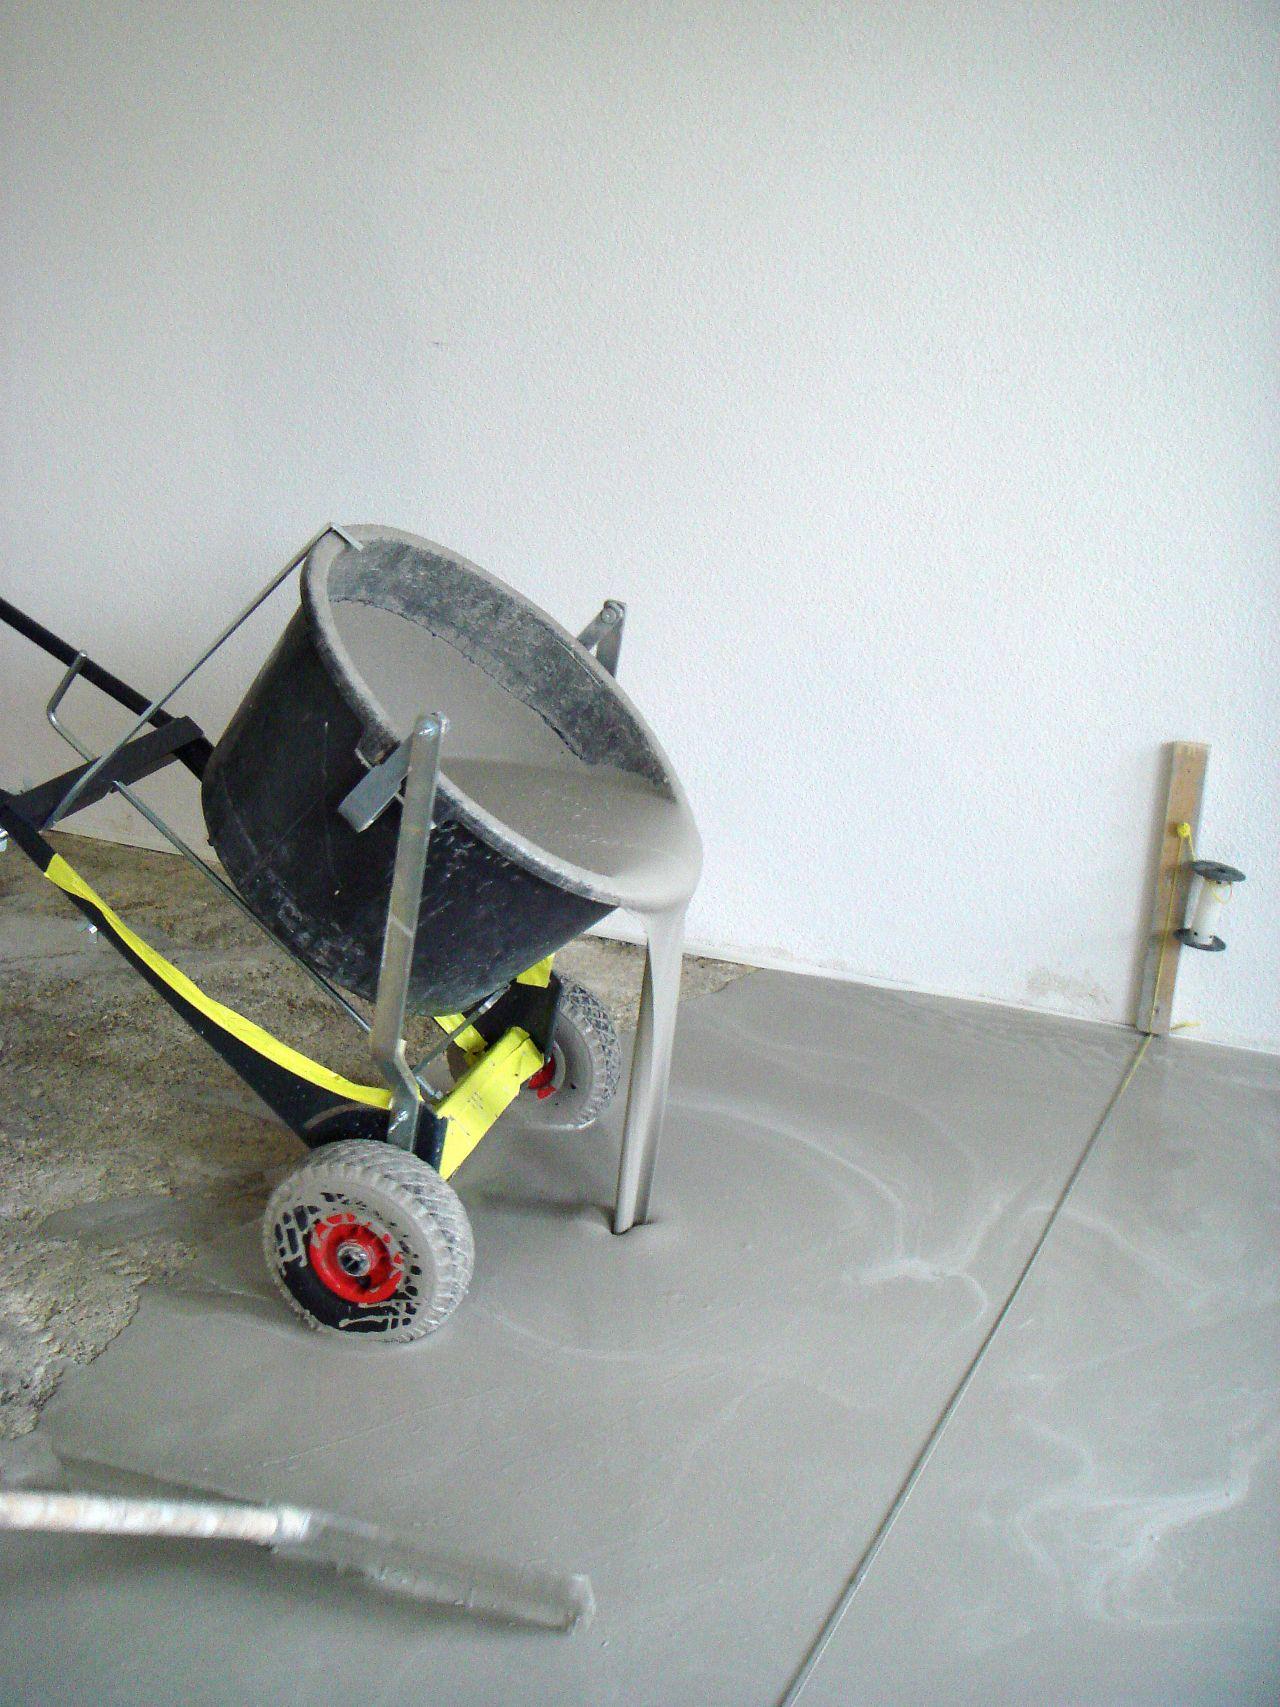 Sika applicator applying floor leveling from yellow bucket to shiny floor